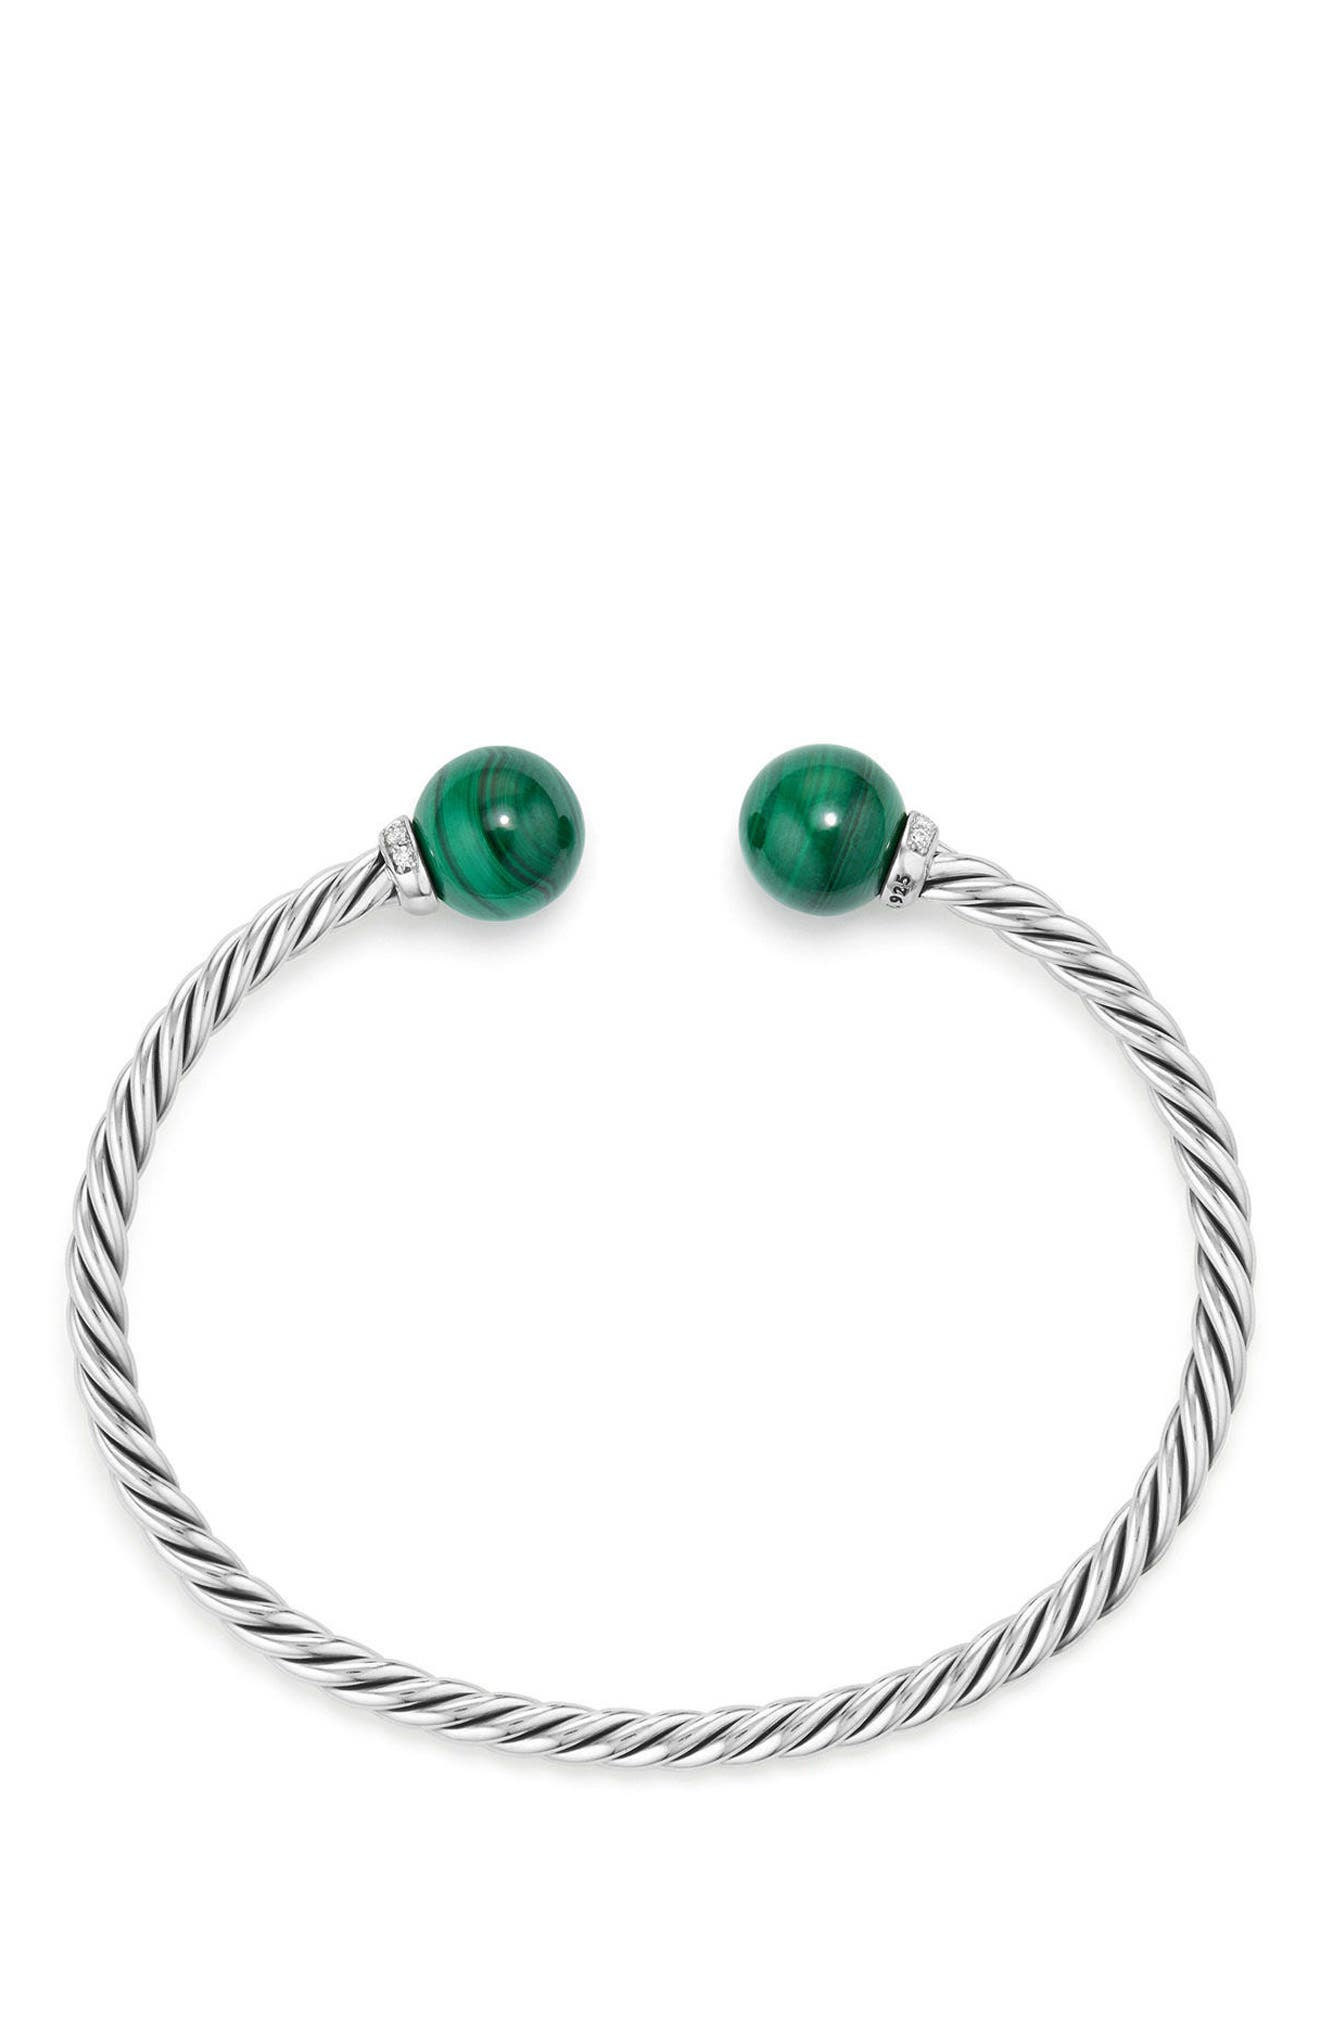 Solari Bead Bracelet with Diamonds,                             Alternate thumbnail 2, color,                             Silver/ Diamond/ Malachite